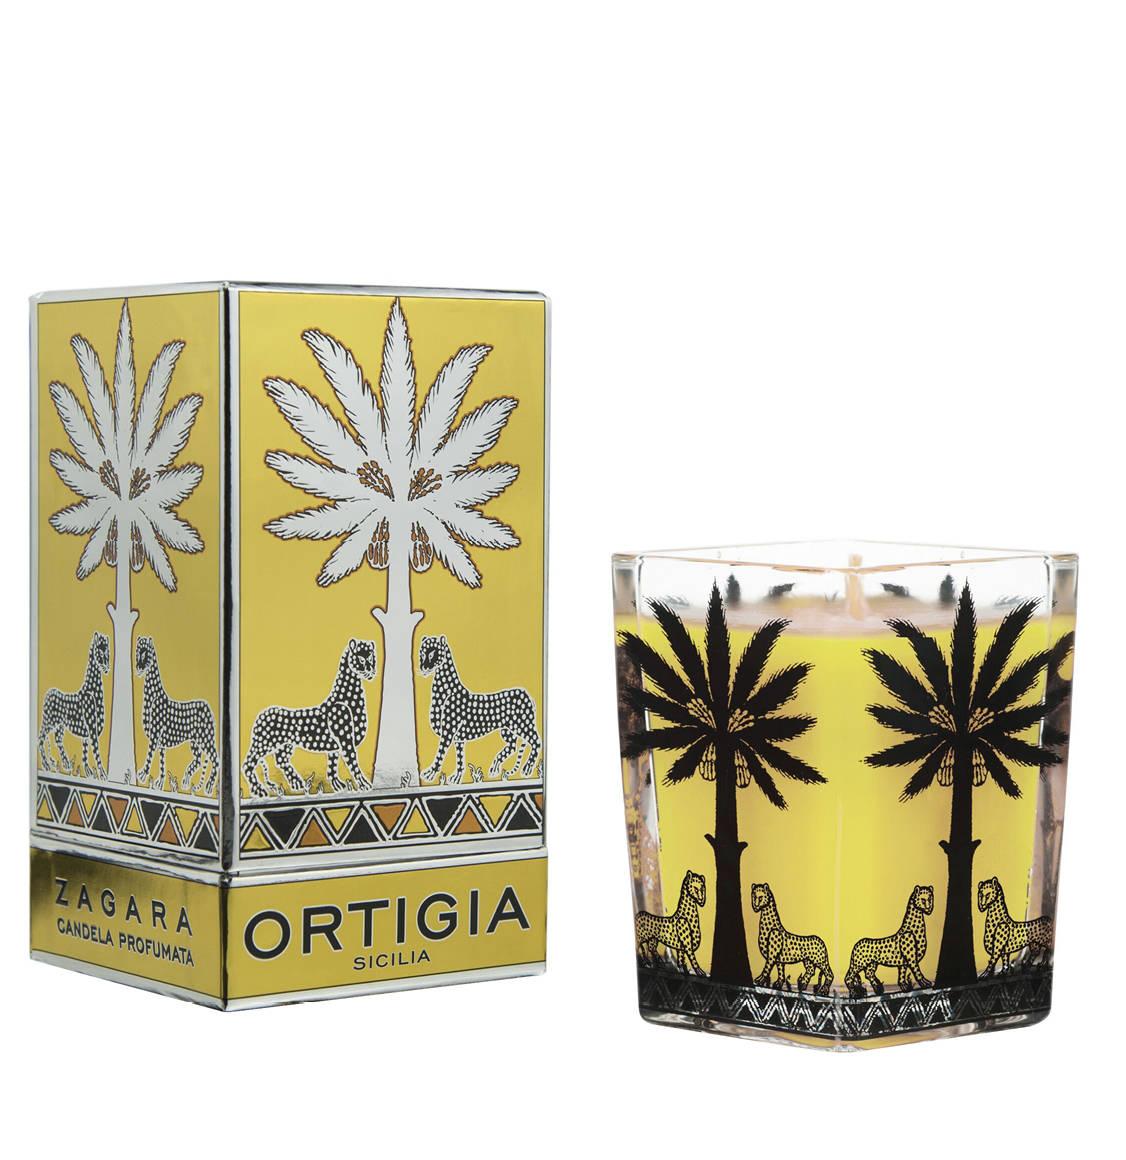 Ortigia_Sicilia_Zagara_Large_Square_Candle_The_Project_Garments_A